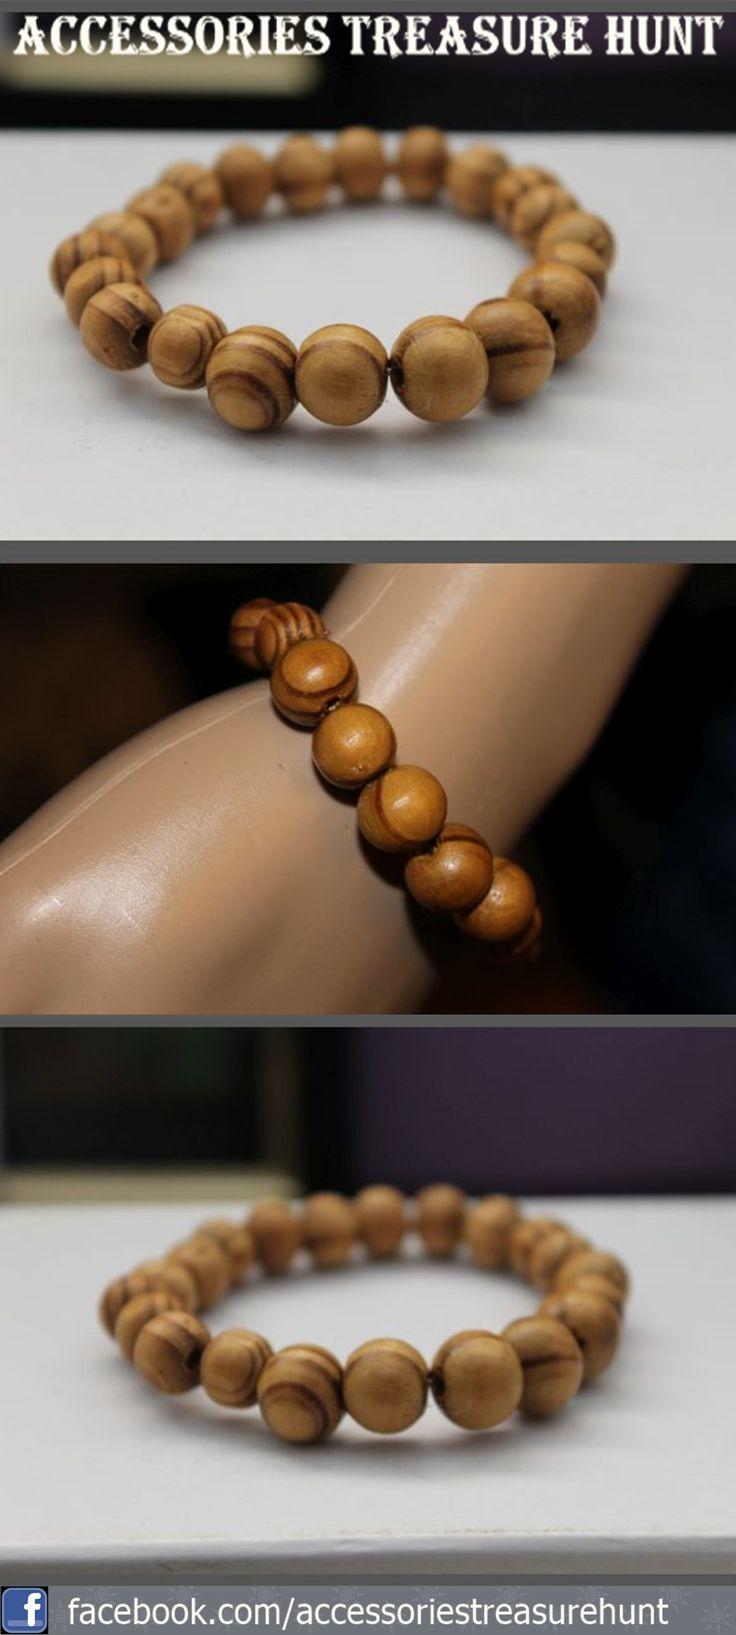 Attractive striped tan beaded bracelets. www.accessoriestreasurehunt.com